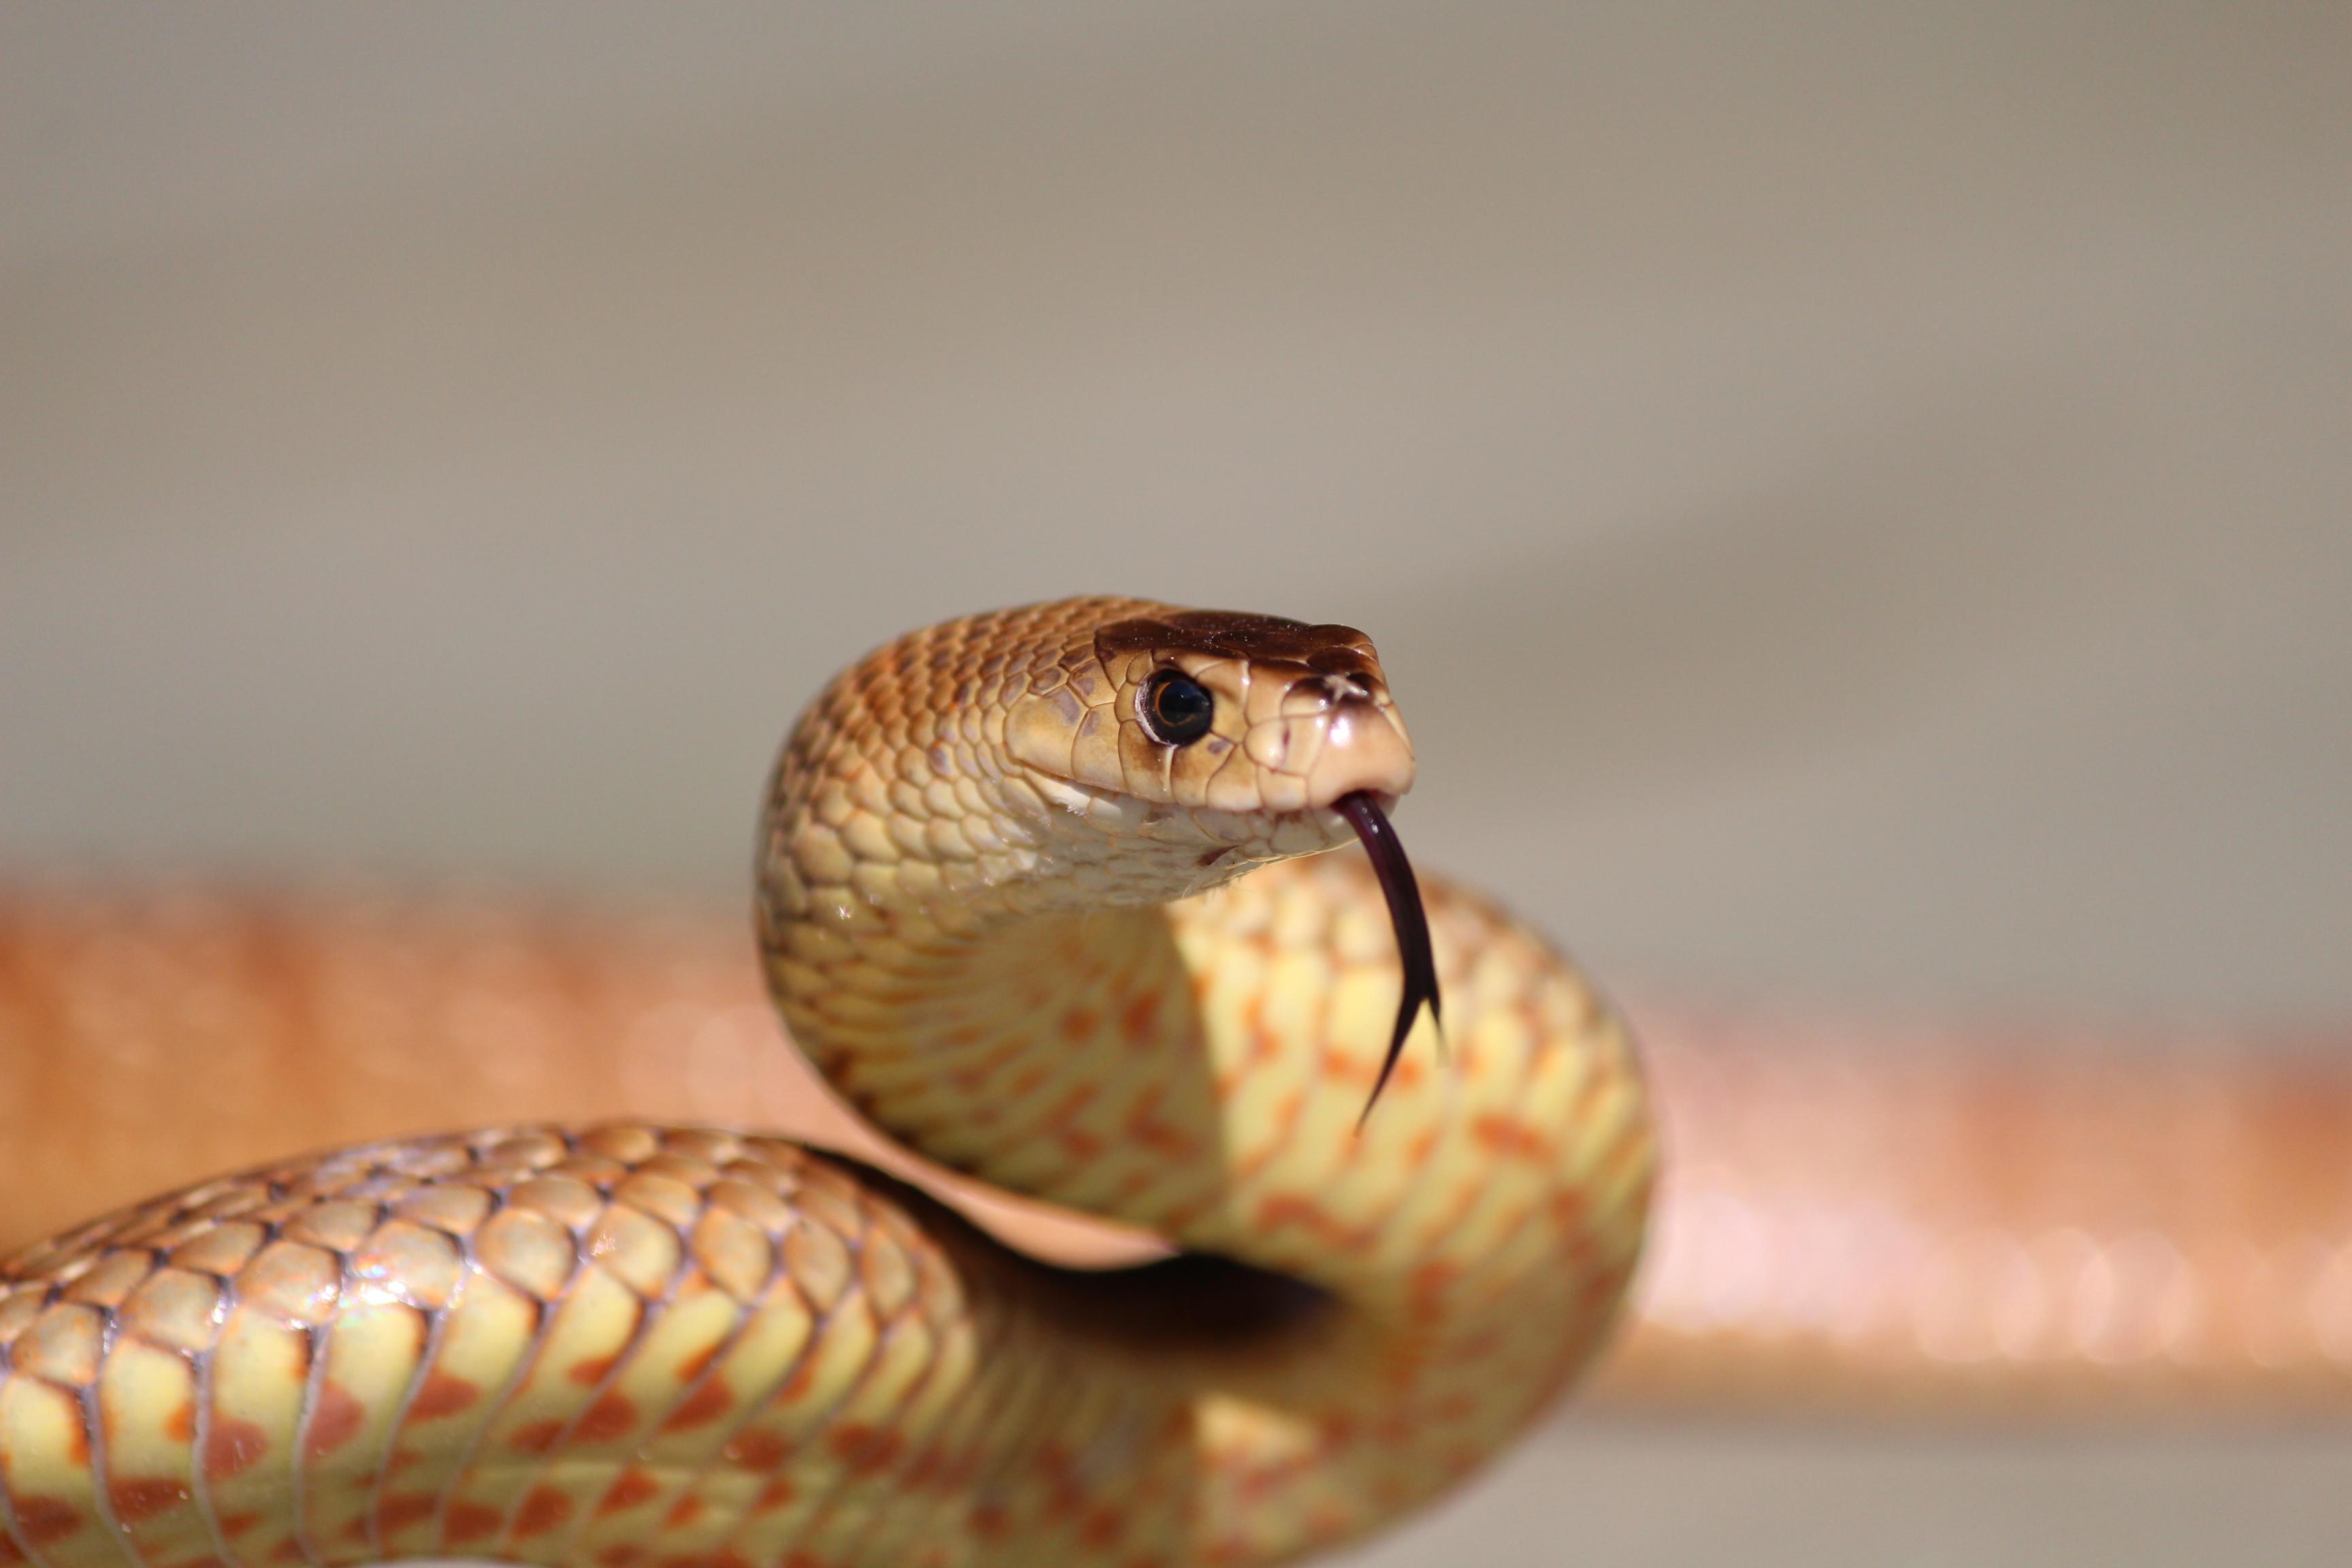 2 Day Venomous Snake Relocation Course